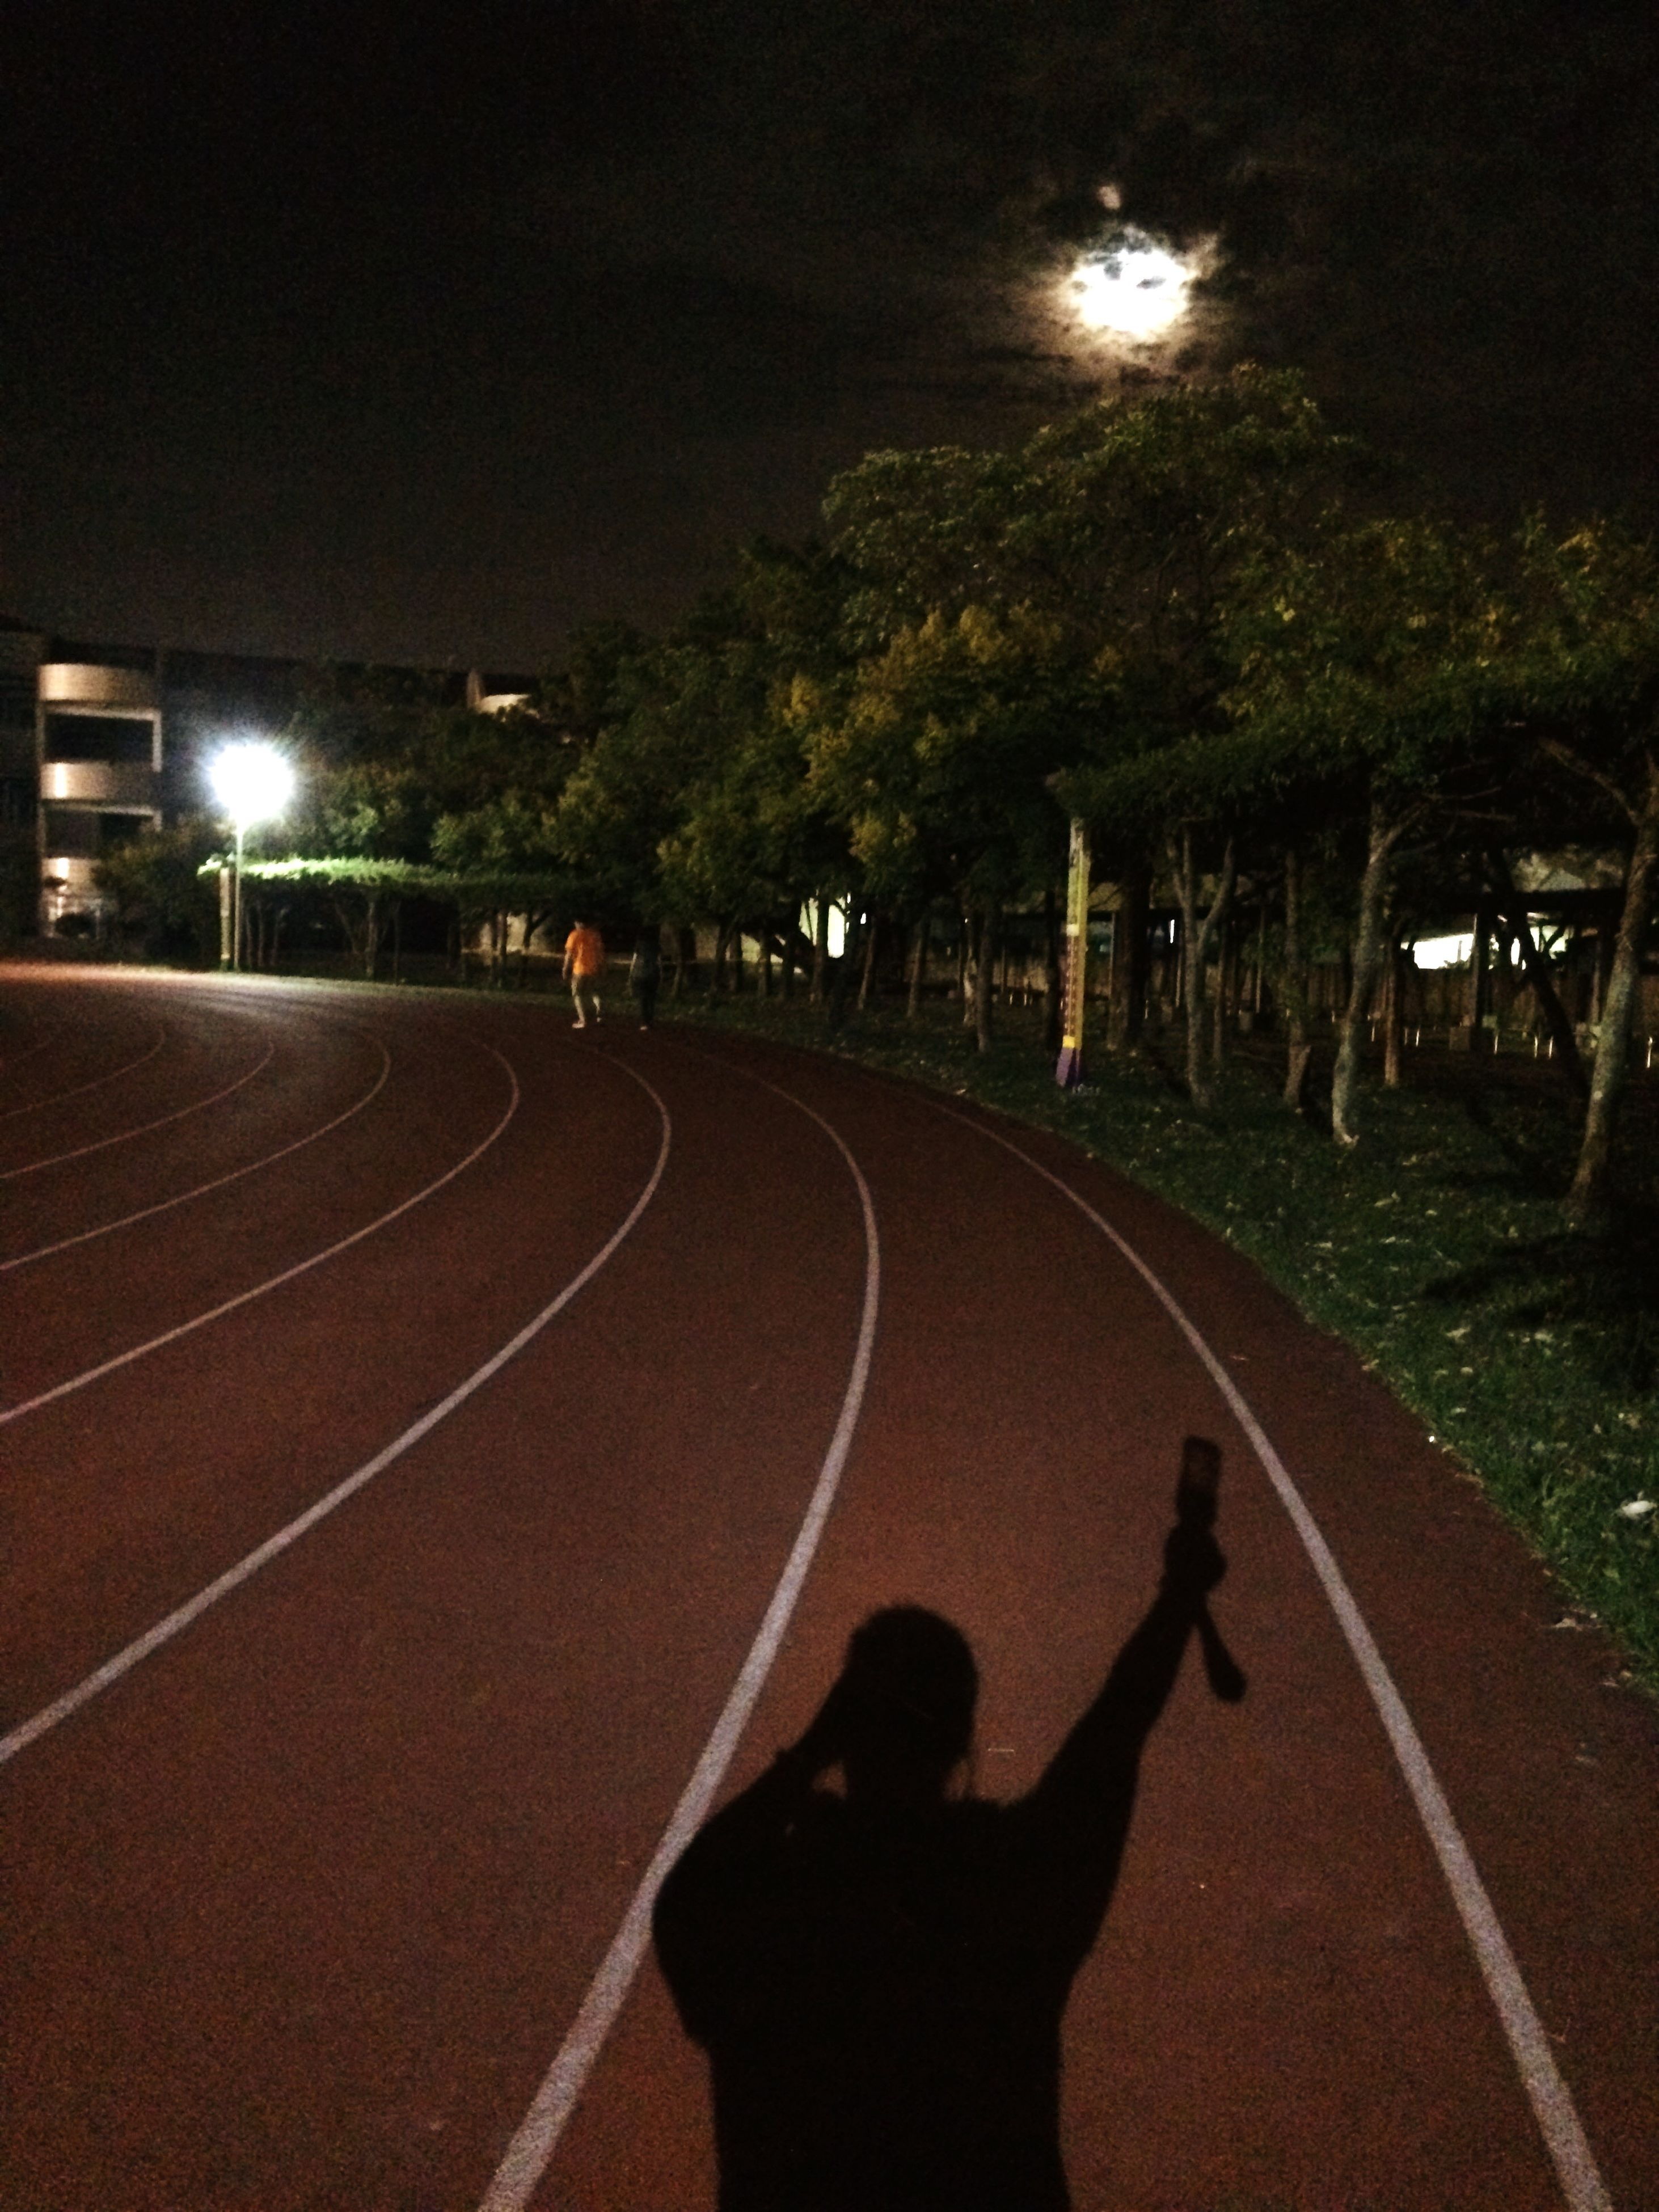 road, night, illuminated, transportation, street, outdoors, holding, solitude, the way forward, remote